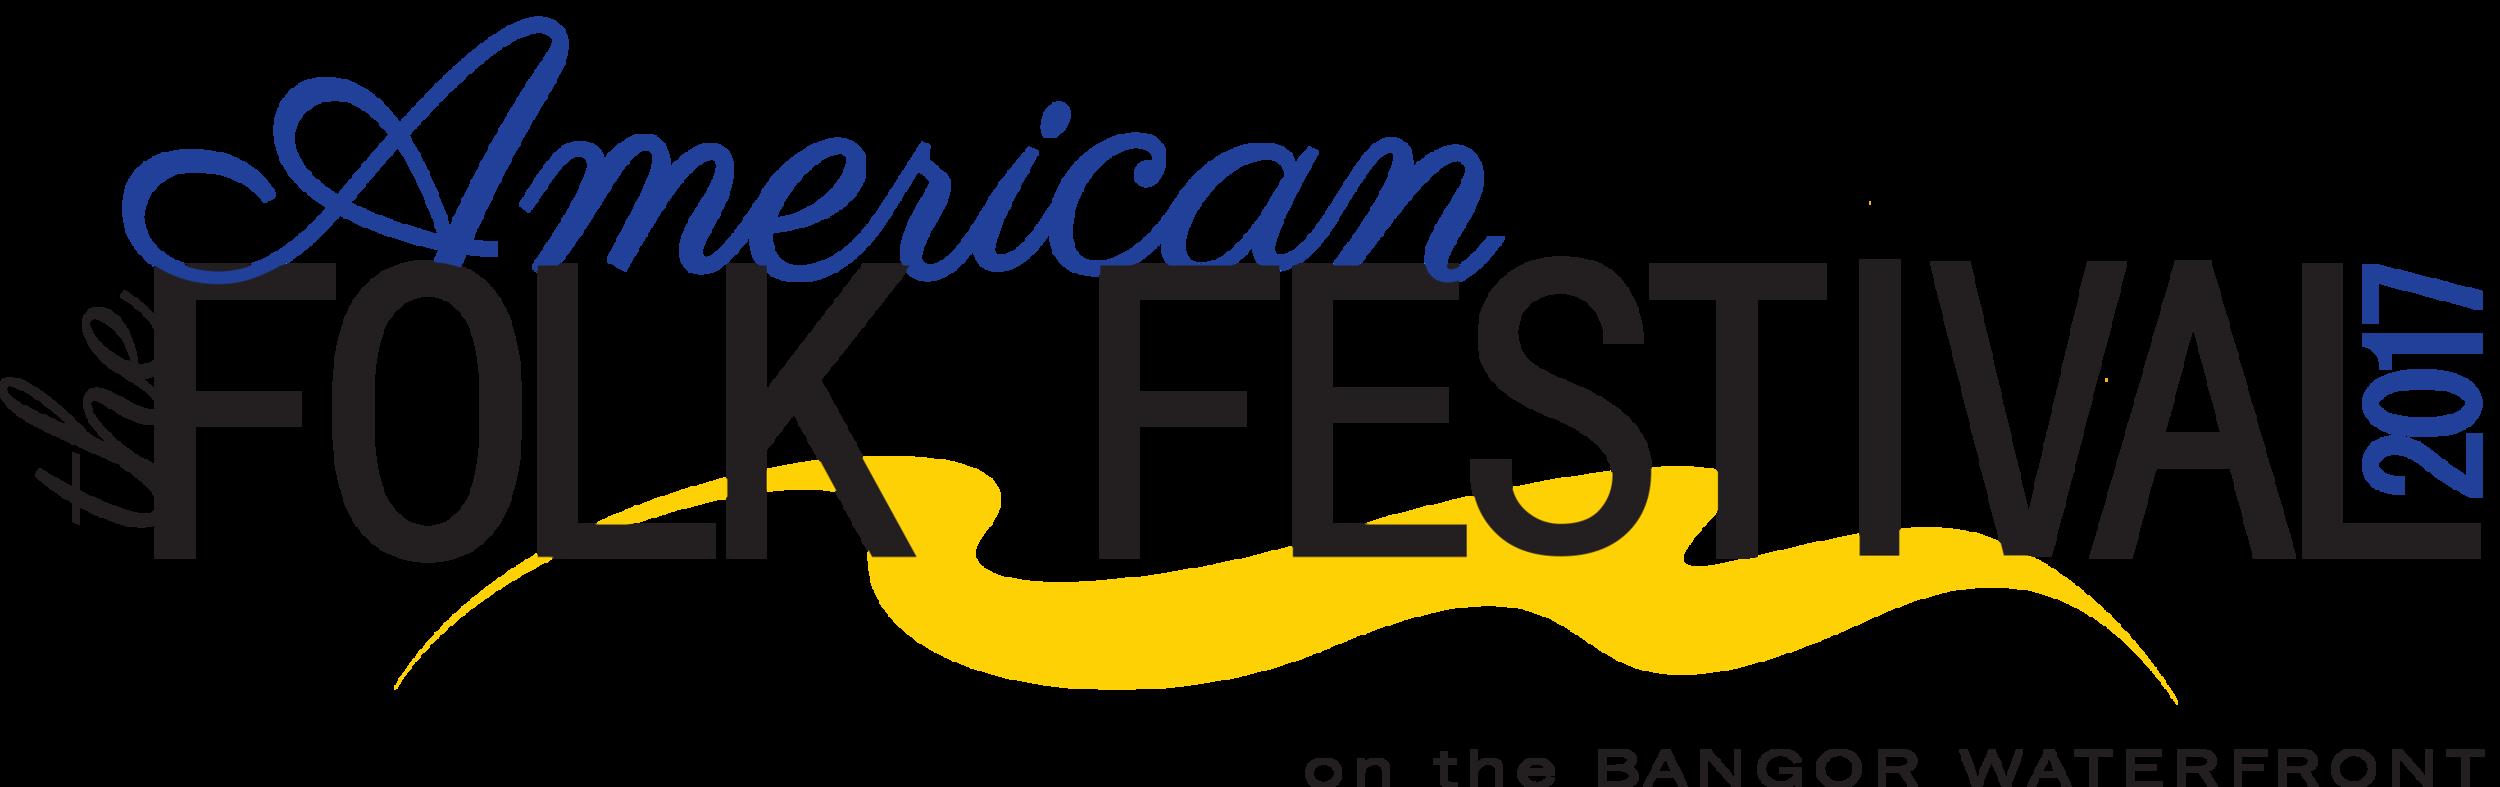 logo-2017-aff.png